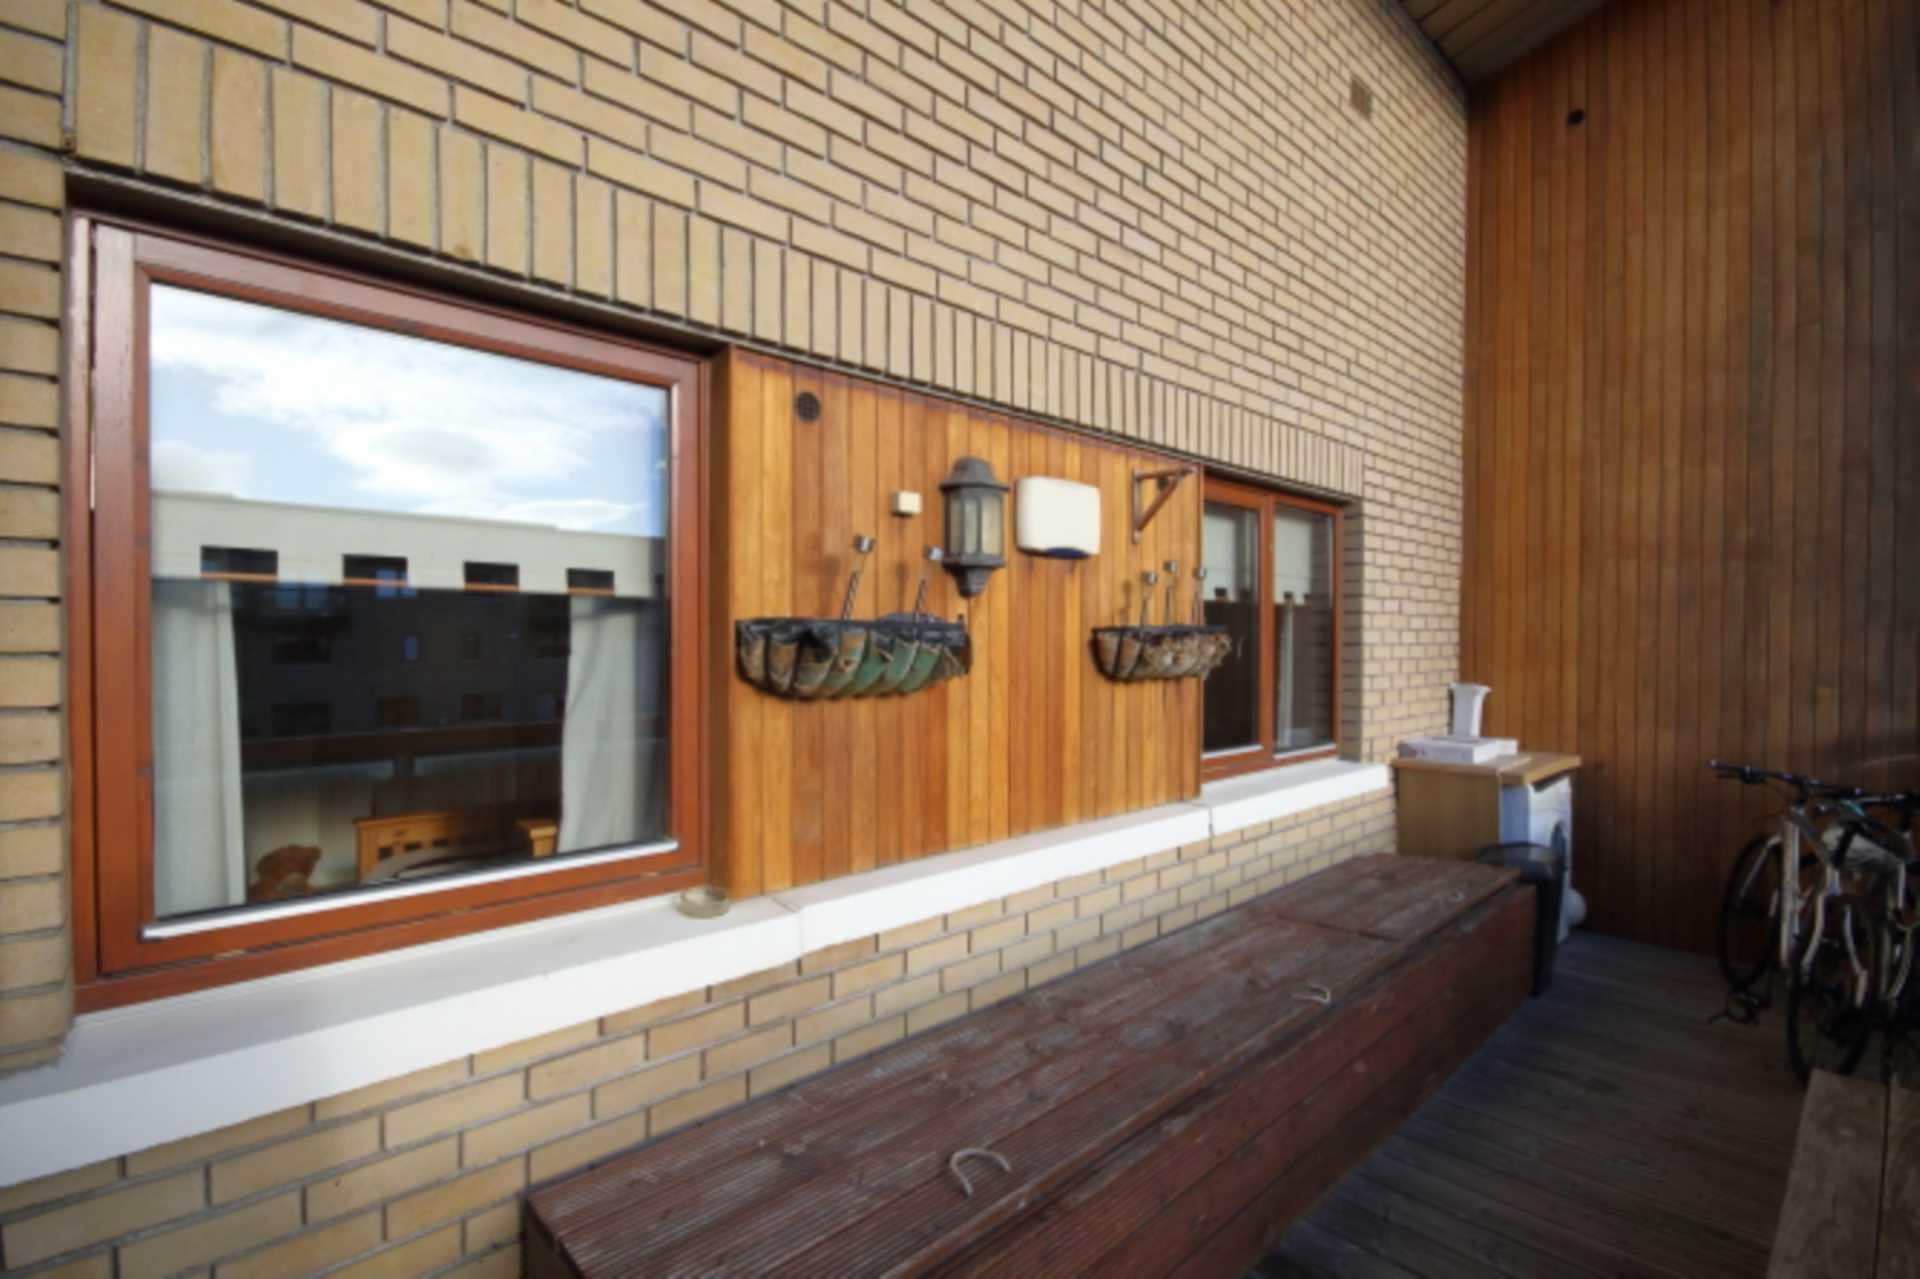 38 Hunters Hall, Hunters Wood, Ballycullen, Dublin 24, Image 10